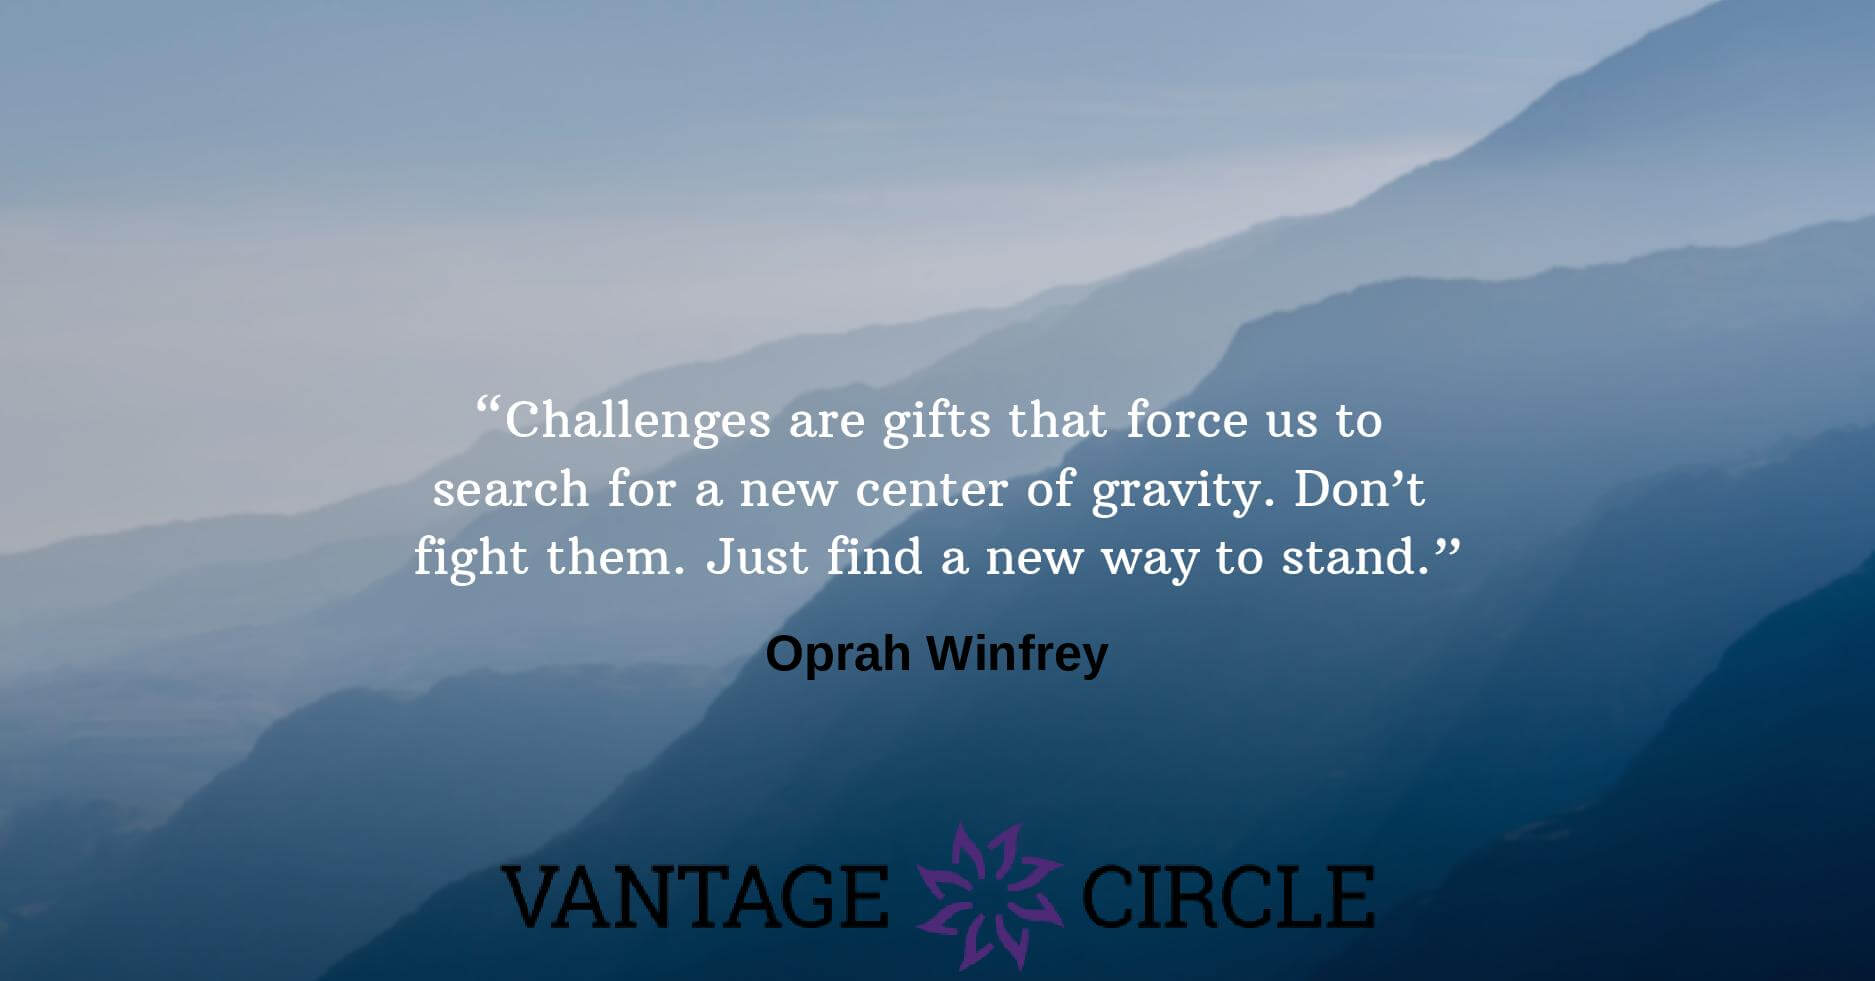 Employee-motivational-quotes-Oprah-Winfrey